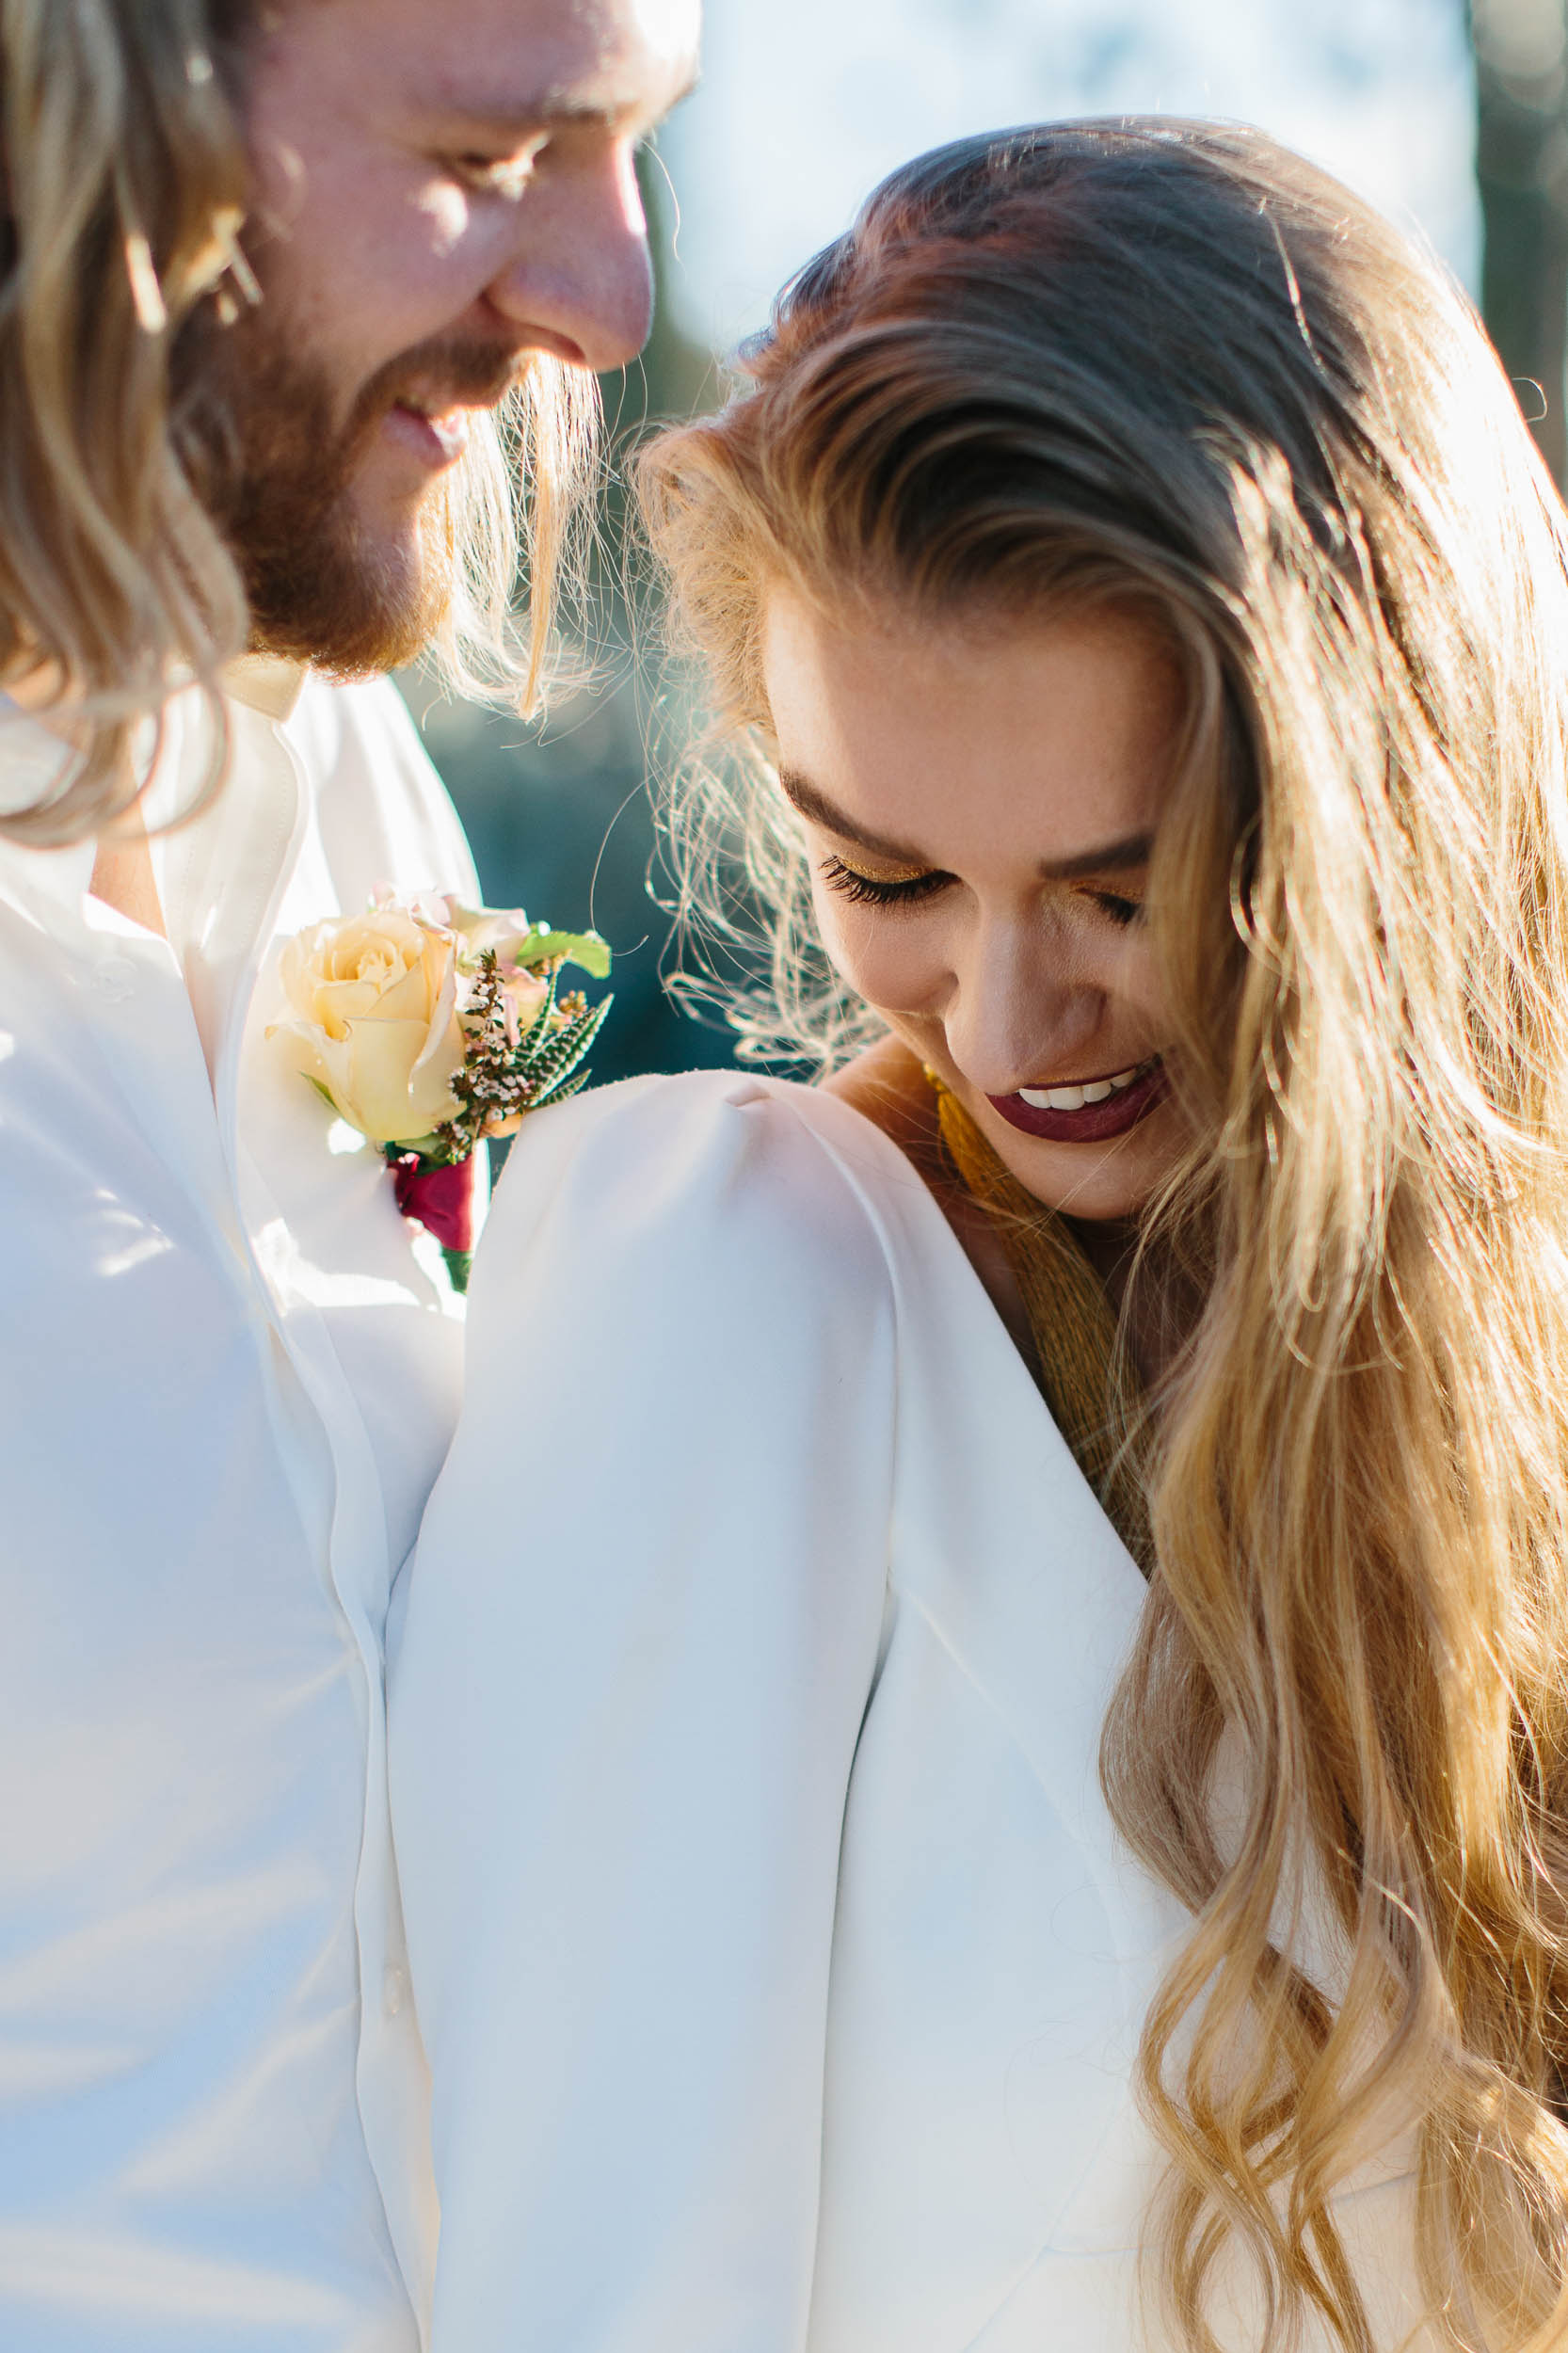 Kas-Richards-Ruby-and-James-Stylist-Cactus-Country-Karen-Willis-Holmes-Bridal-One-Heart-Studios-Boho-Wedding-31.jpg